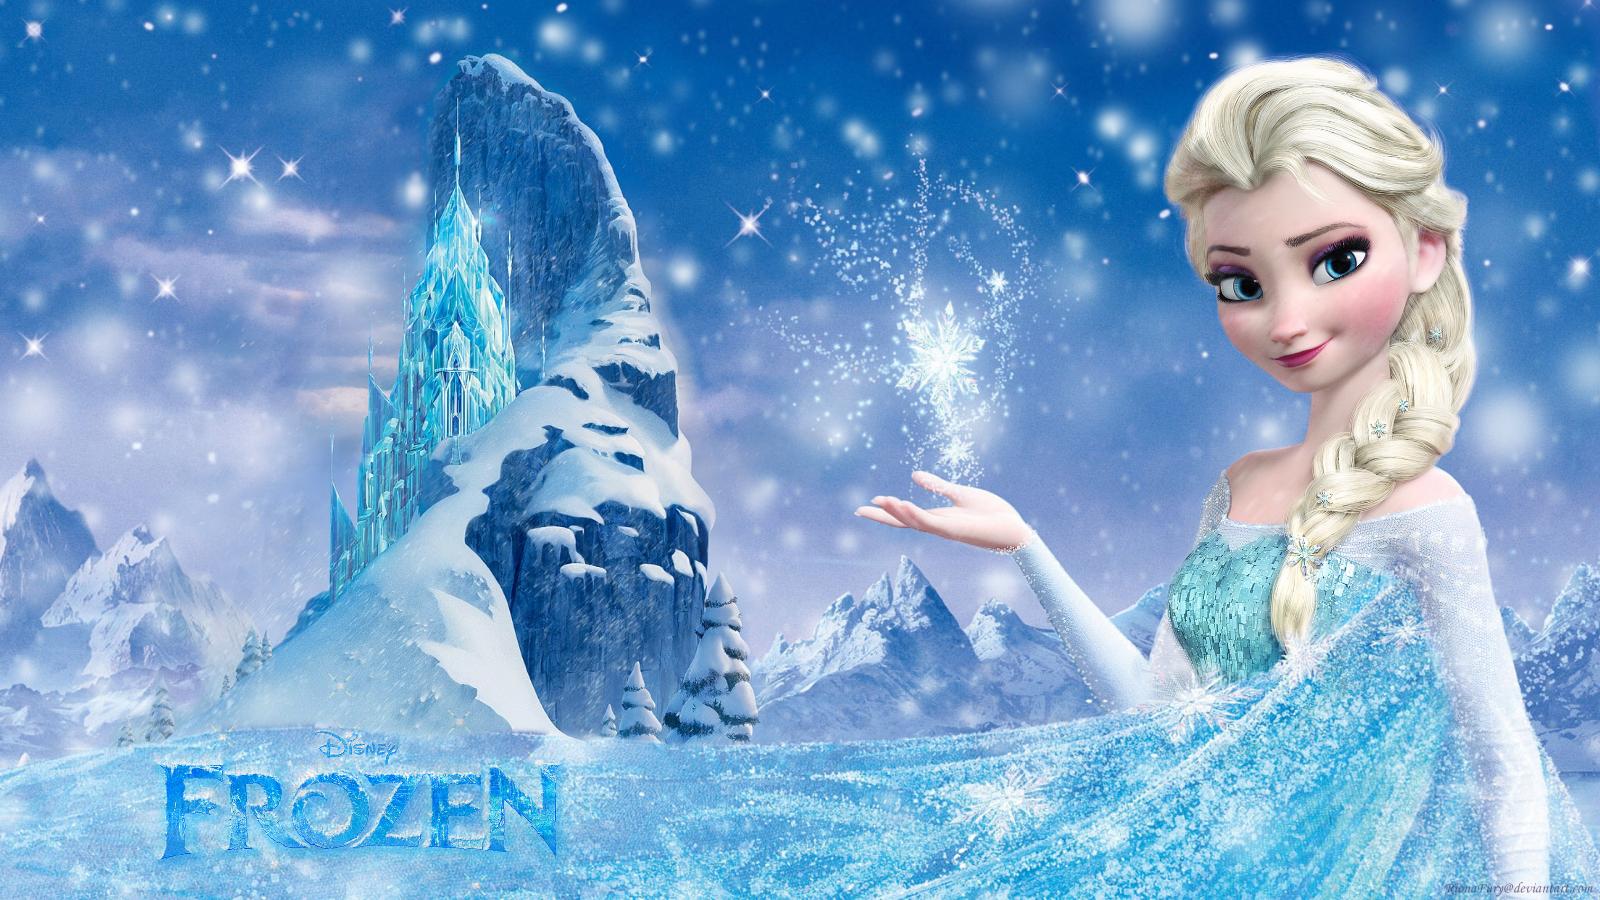 Iphone wallpaper disney hd - Disney Frozen Elsa Wallpaper Wallpapersafari